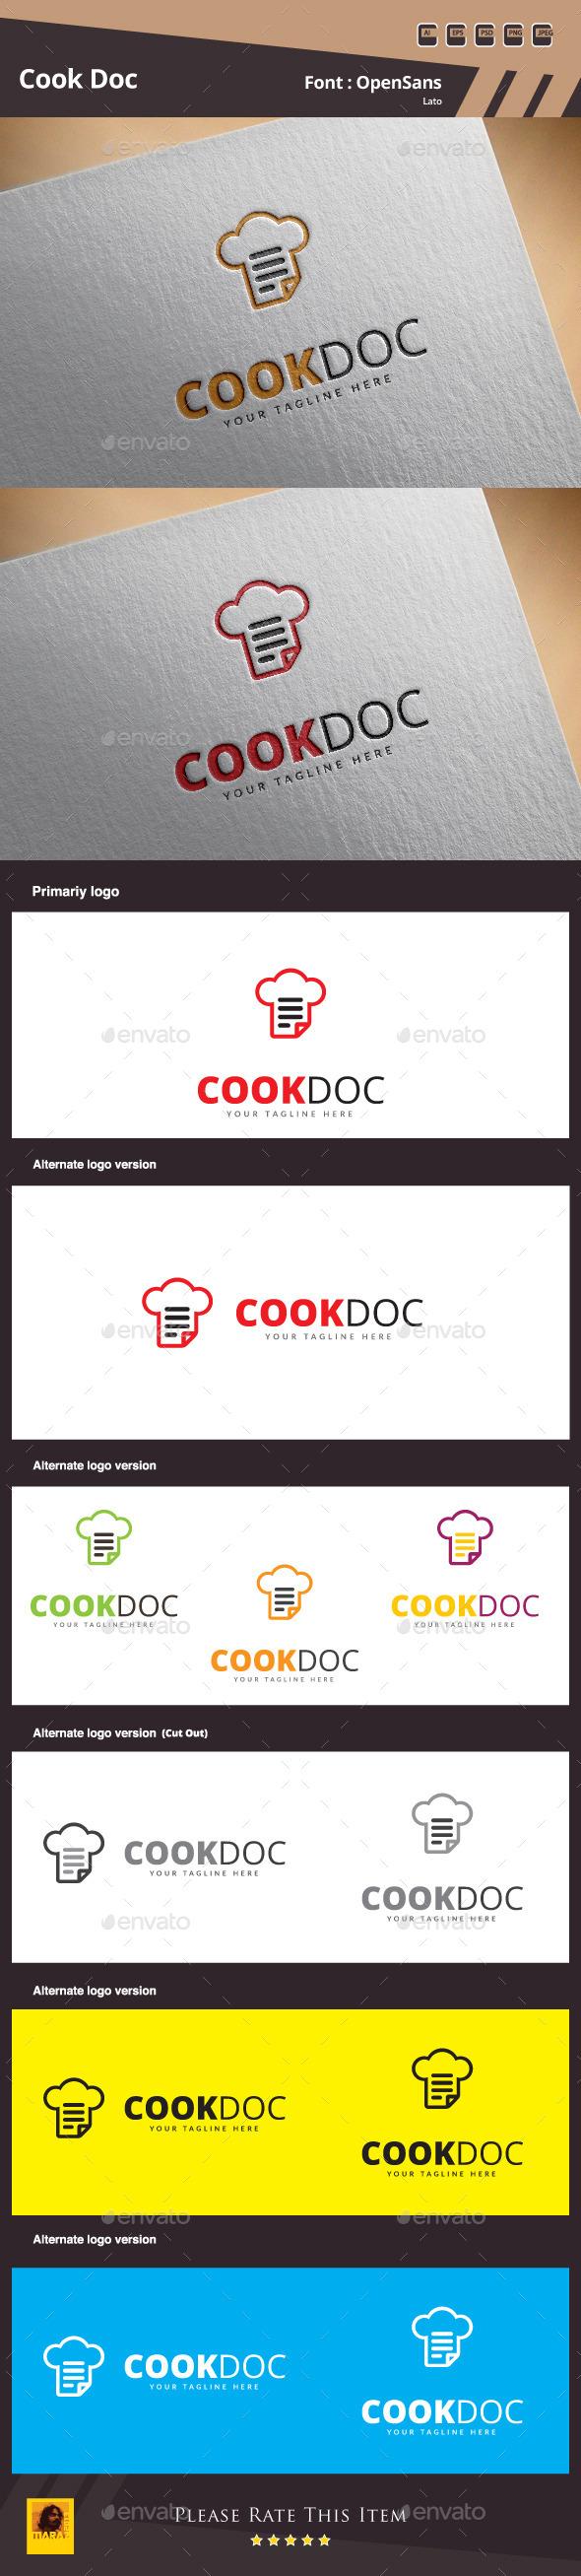 Cook Doc Logo Template - Food Logo Templates